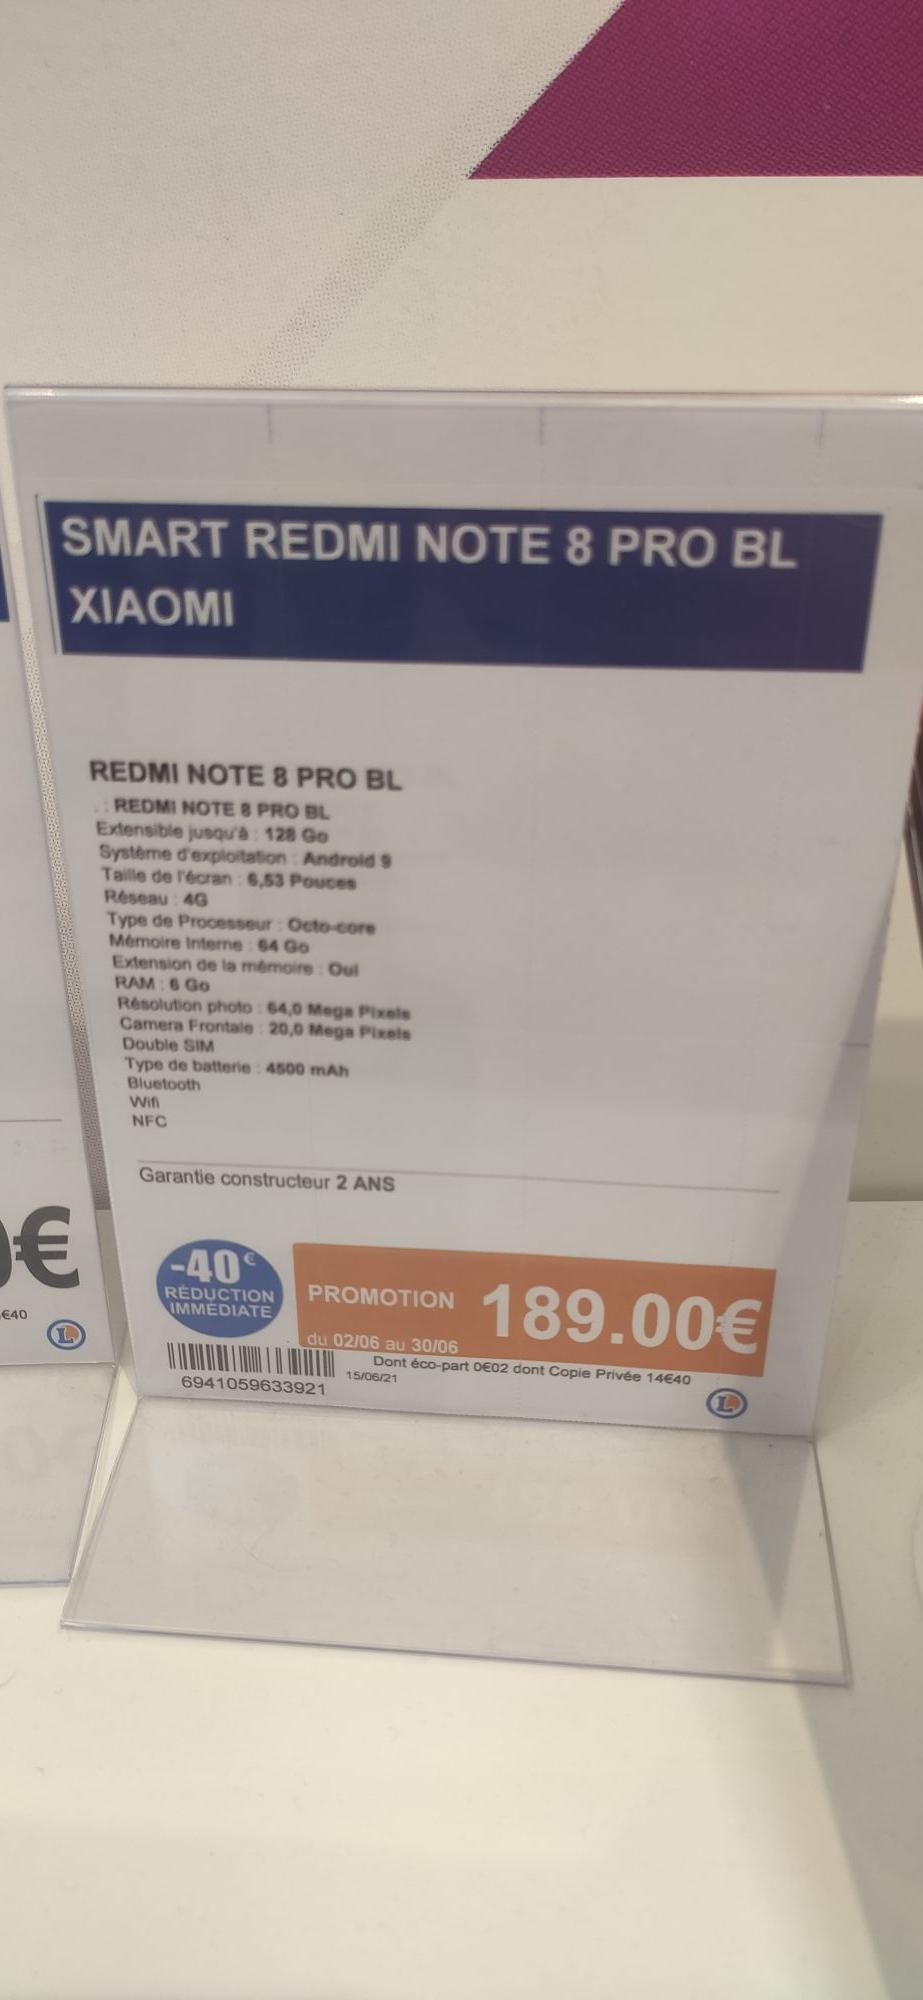 "Smartphone 6.63"" Xiaomi Redmi Note 8 Pro - 128 Go (La Ferté-Bernard 72)"